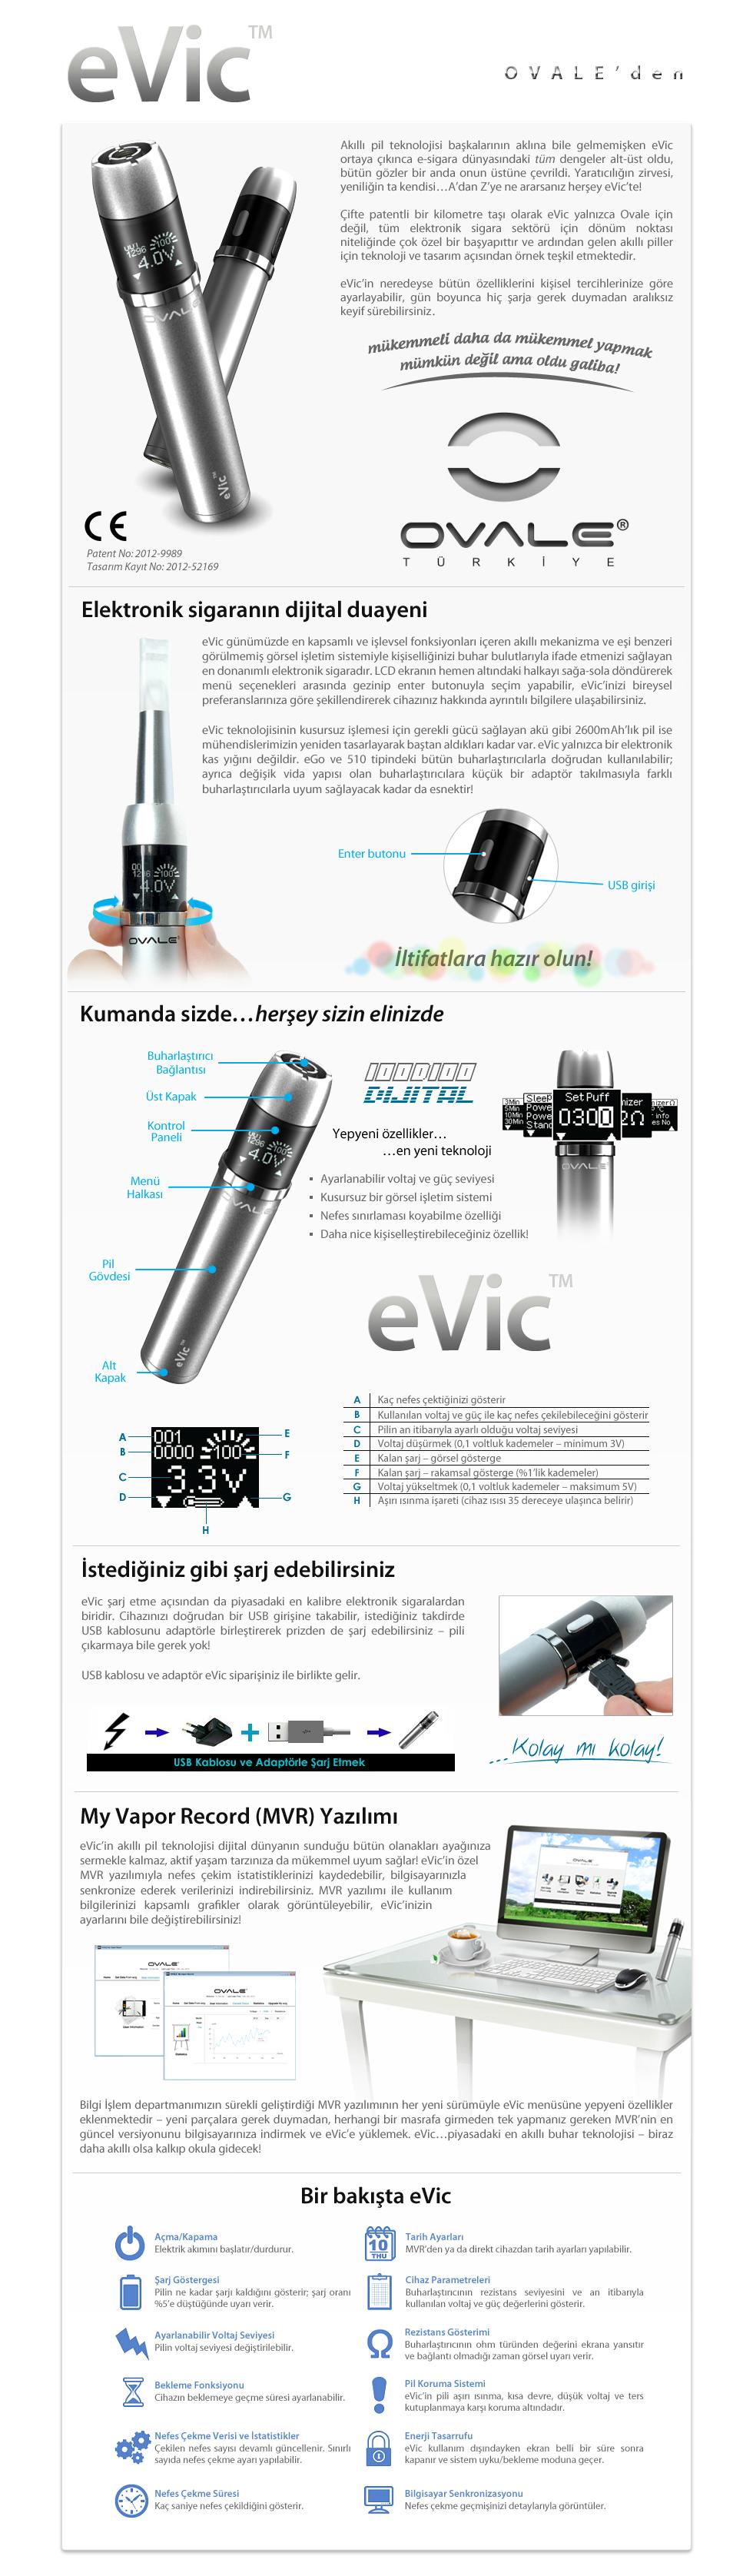 elektronik sigara, esigara, e, sigara, buhar, mod, apv, ovale, joyetech, evic